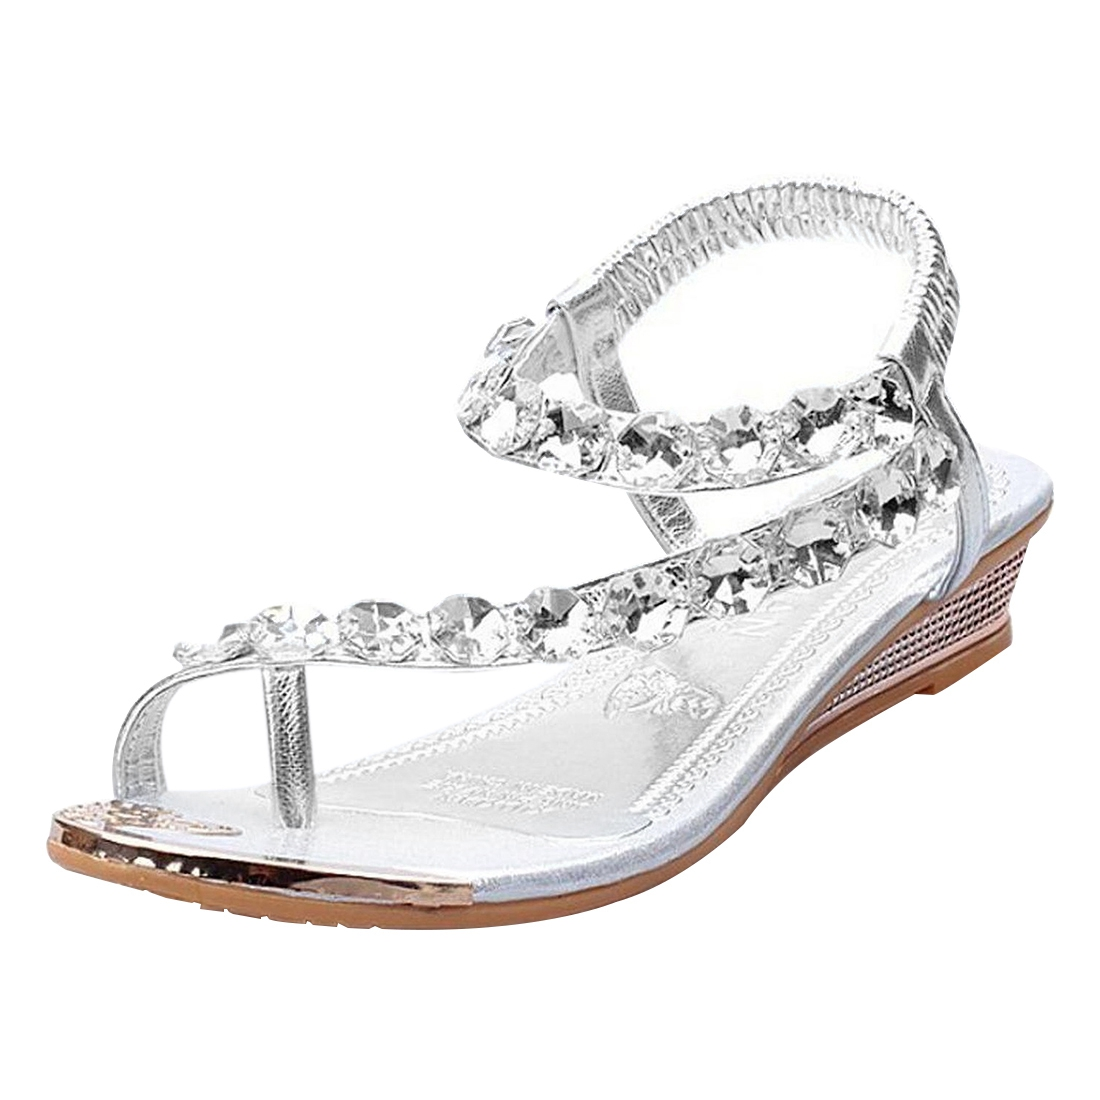 58fb3685de8930 Detail Feedback Questions about 1 pair Womens Sandals Ladies Low Heel  Sparkling Shoes Rhinestone Diamante Flip Flops